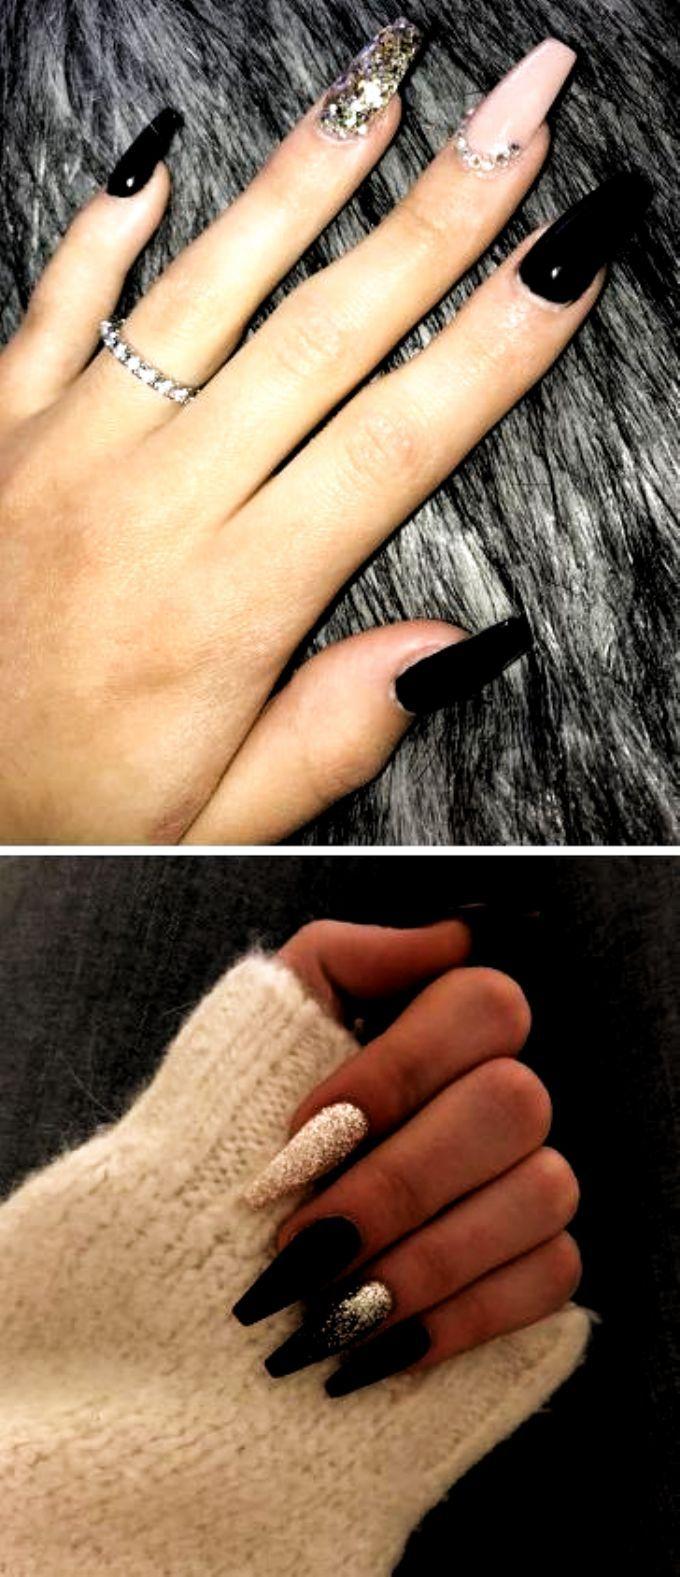 Black Coffin Nails Nails Acrylic Fall Colors In 2020 Black Coffin Nails Coffin Nails Drip Nails